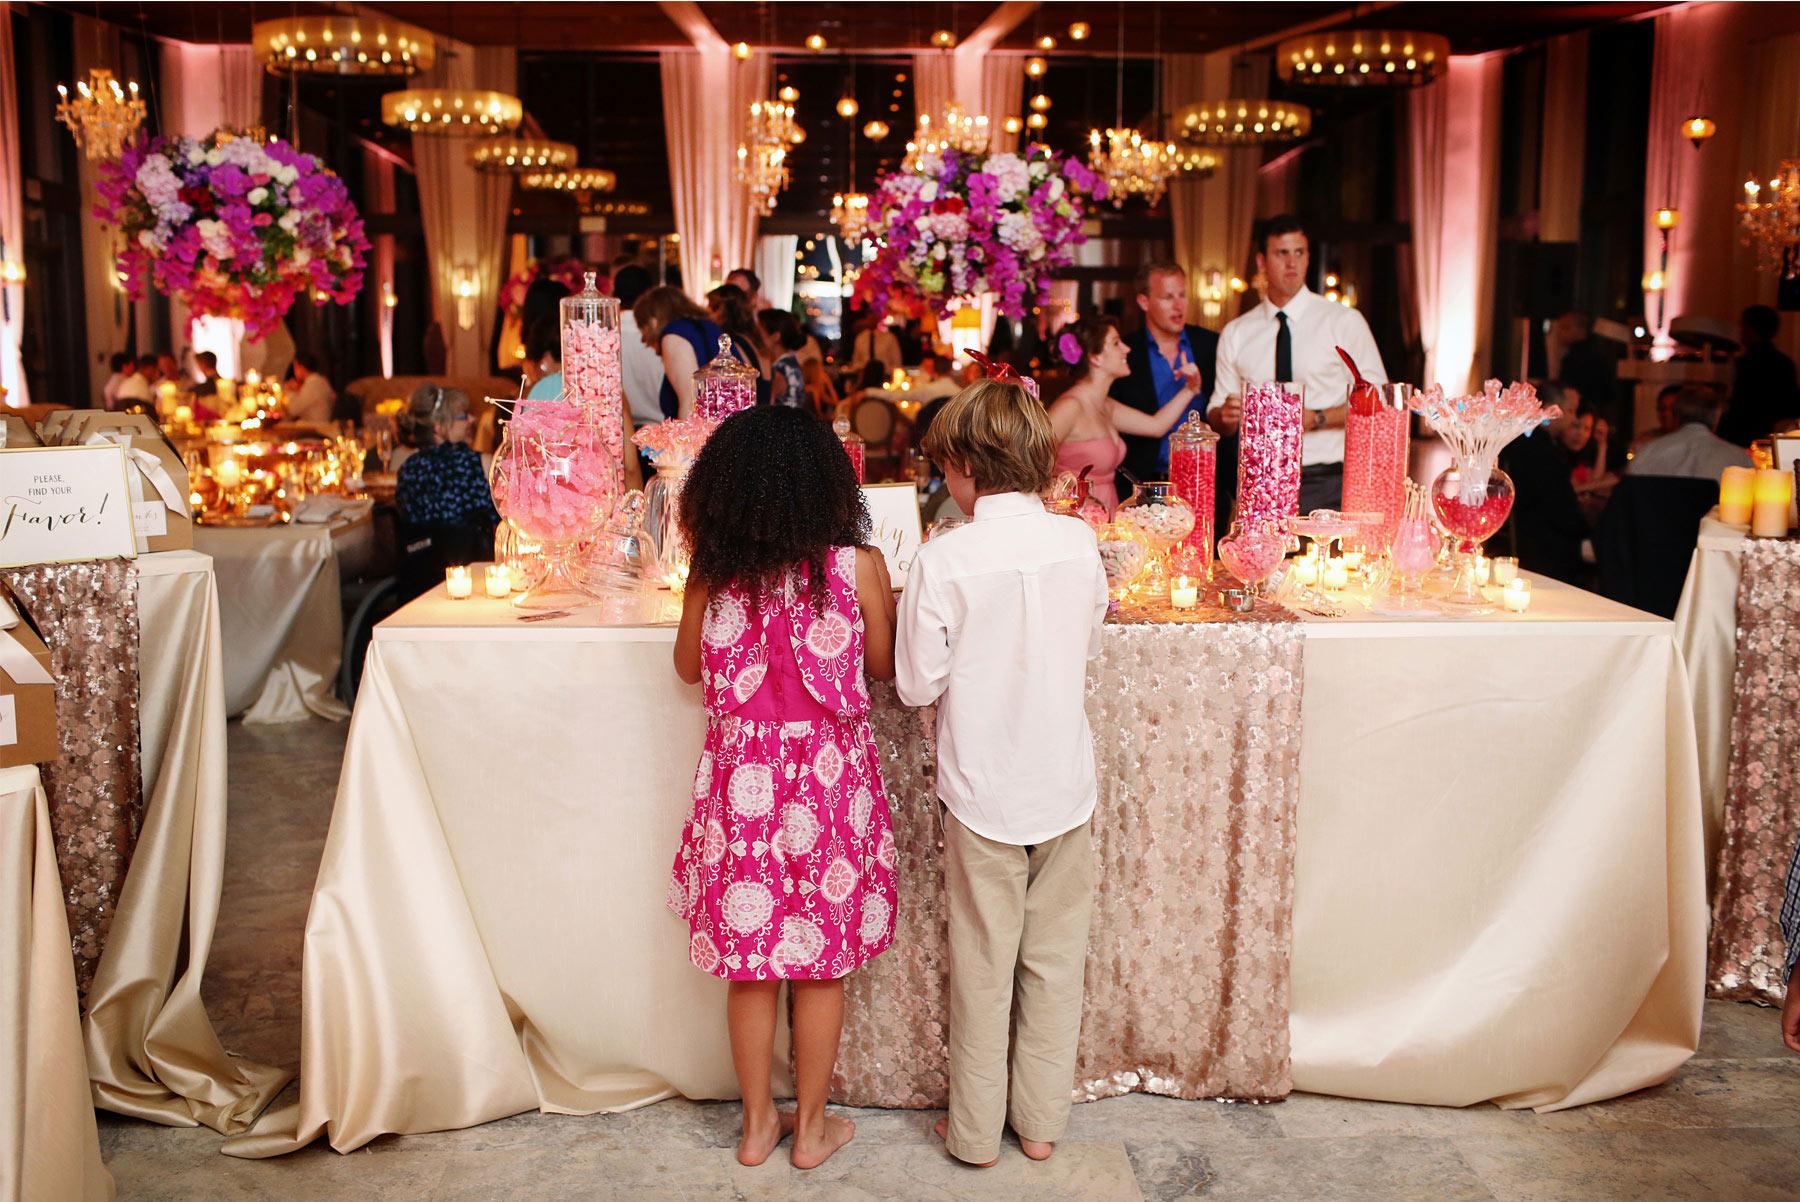 20-Puerto-Rico-Wedding-Photography-by-Vick-Photography-Ritz-Carlton-Reserve-Destination-Wedding-Island-Tropical-Paradise-Resort-Reception-Candy-Bar-Flowers-Decor-Chanel-and-Sam.jpg